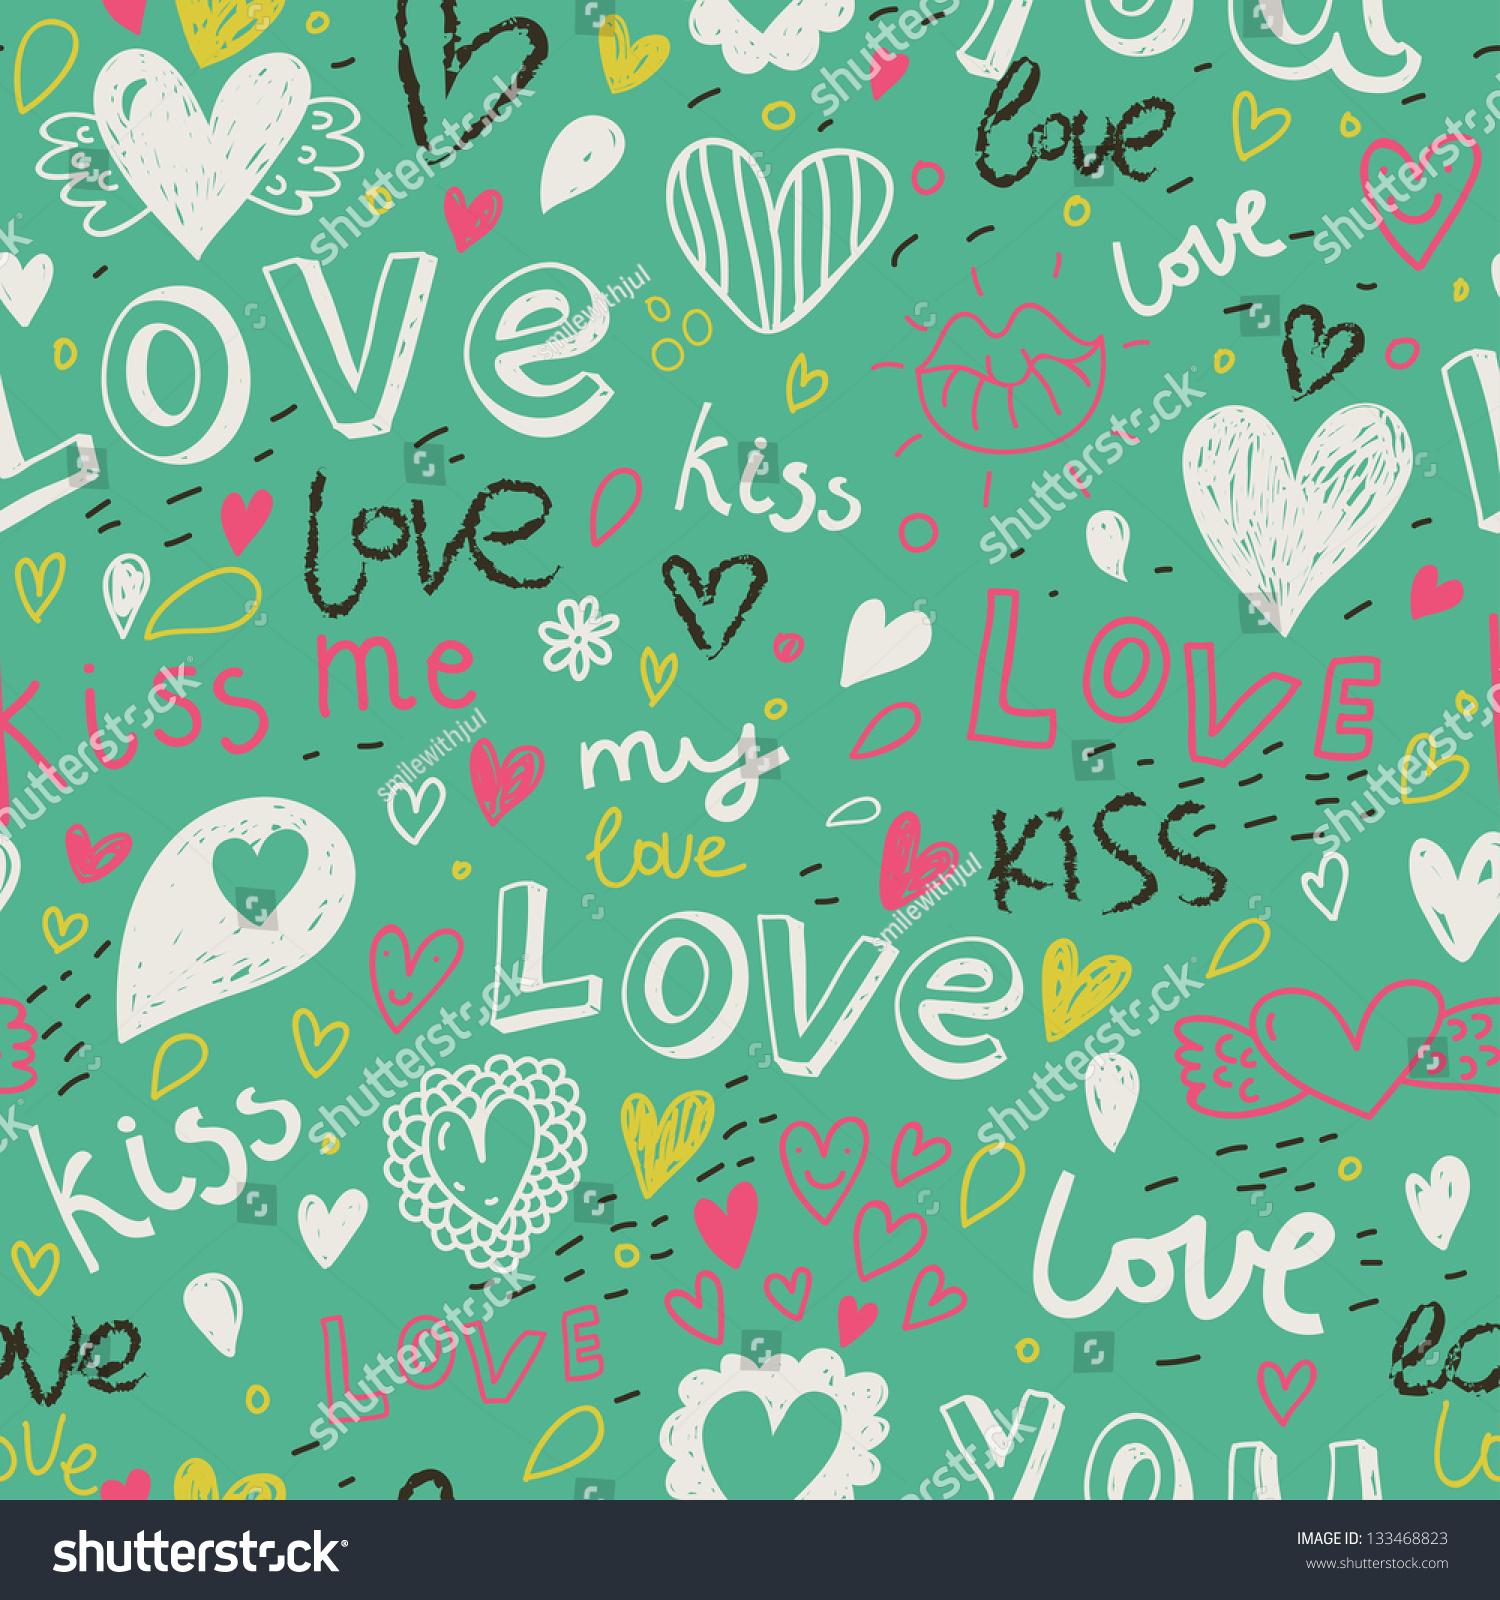 Romantic vector seamless background greeting card wallpaper vector art -  Vectors Illustrations Footage Music Romantic Seamless Pattern Love Concept Background Seamless Pattern Can Be Used For Wallpaper